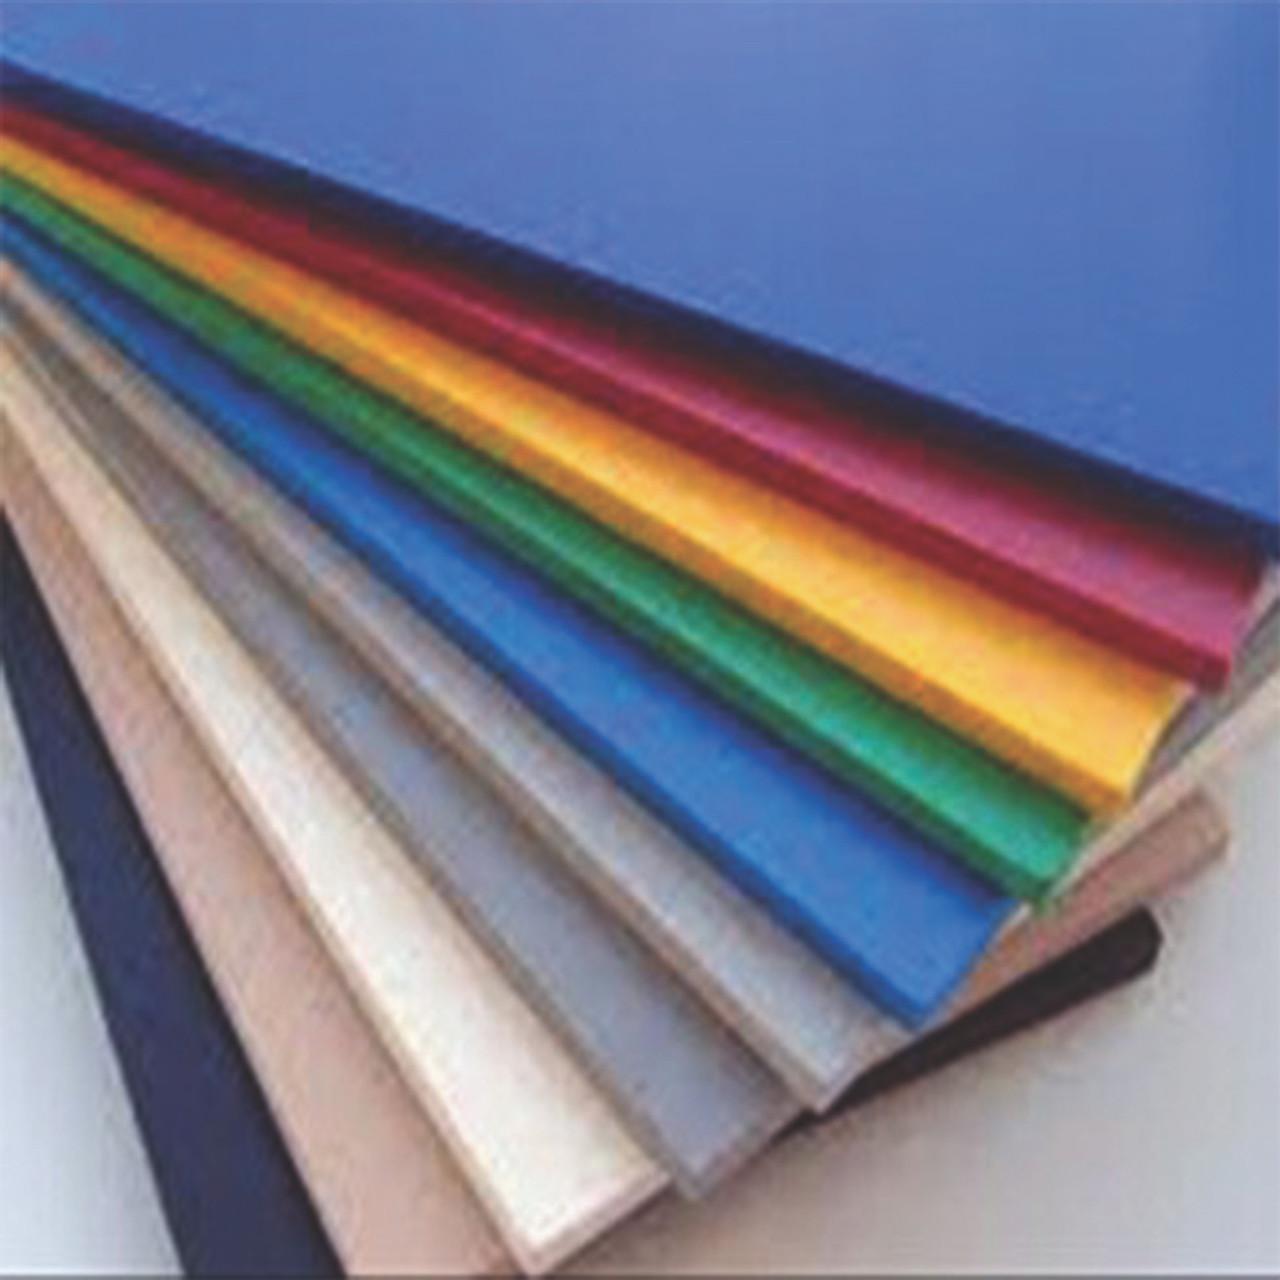 Sintra Board Black - 4' x 8' x 3mm (122cm x 244cm )